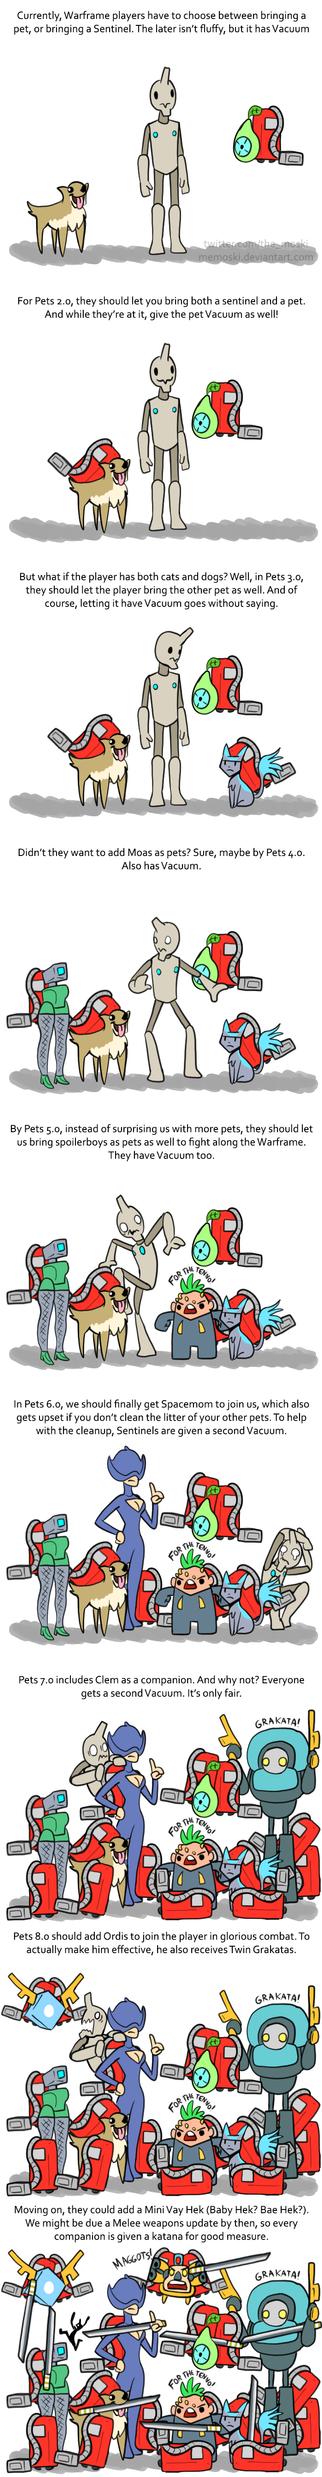 Warframe Pets by Memoski